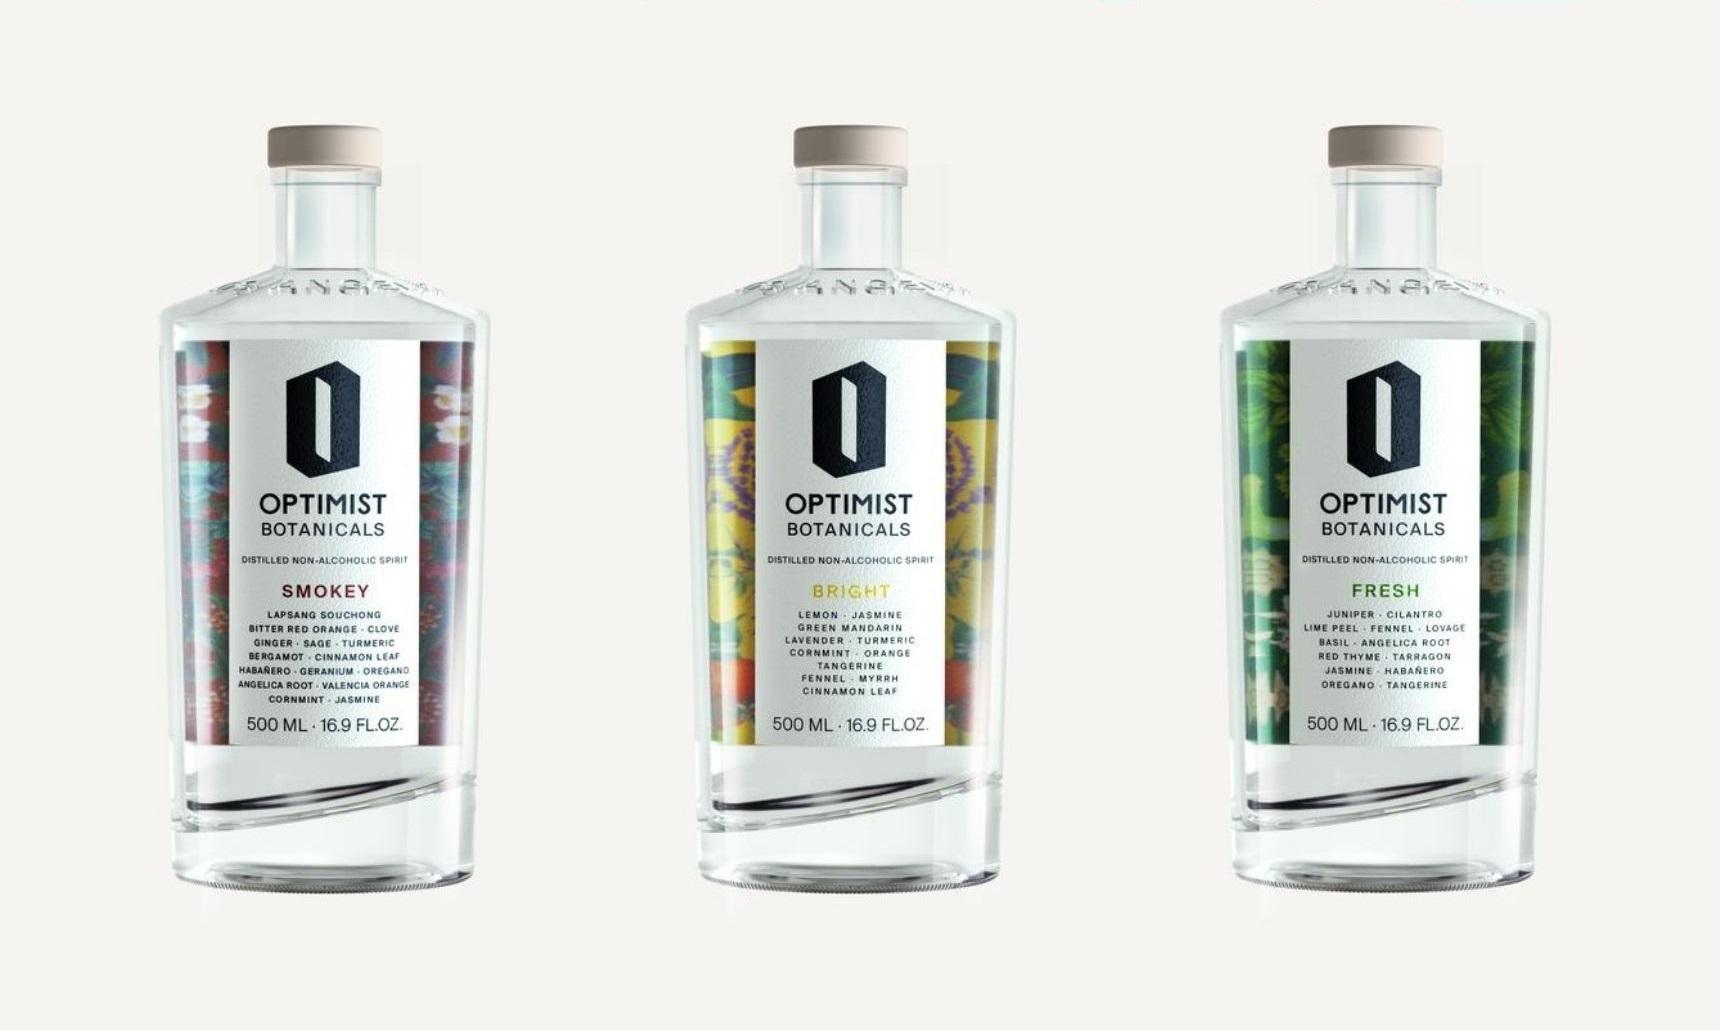 Introducing: Optimist Drinks Non-Alcoholic Clean Botanical Spirits